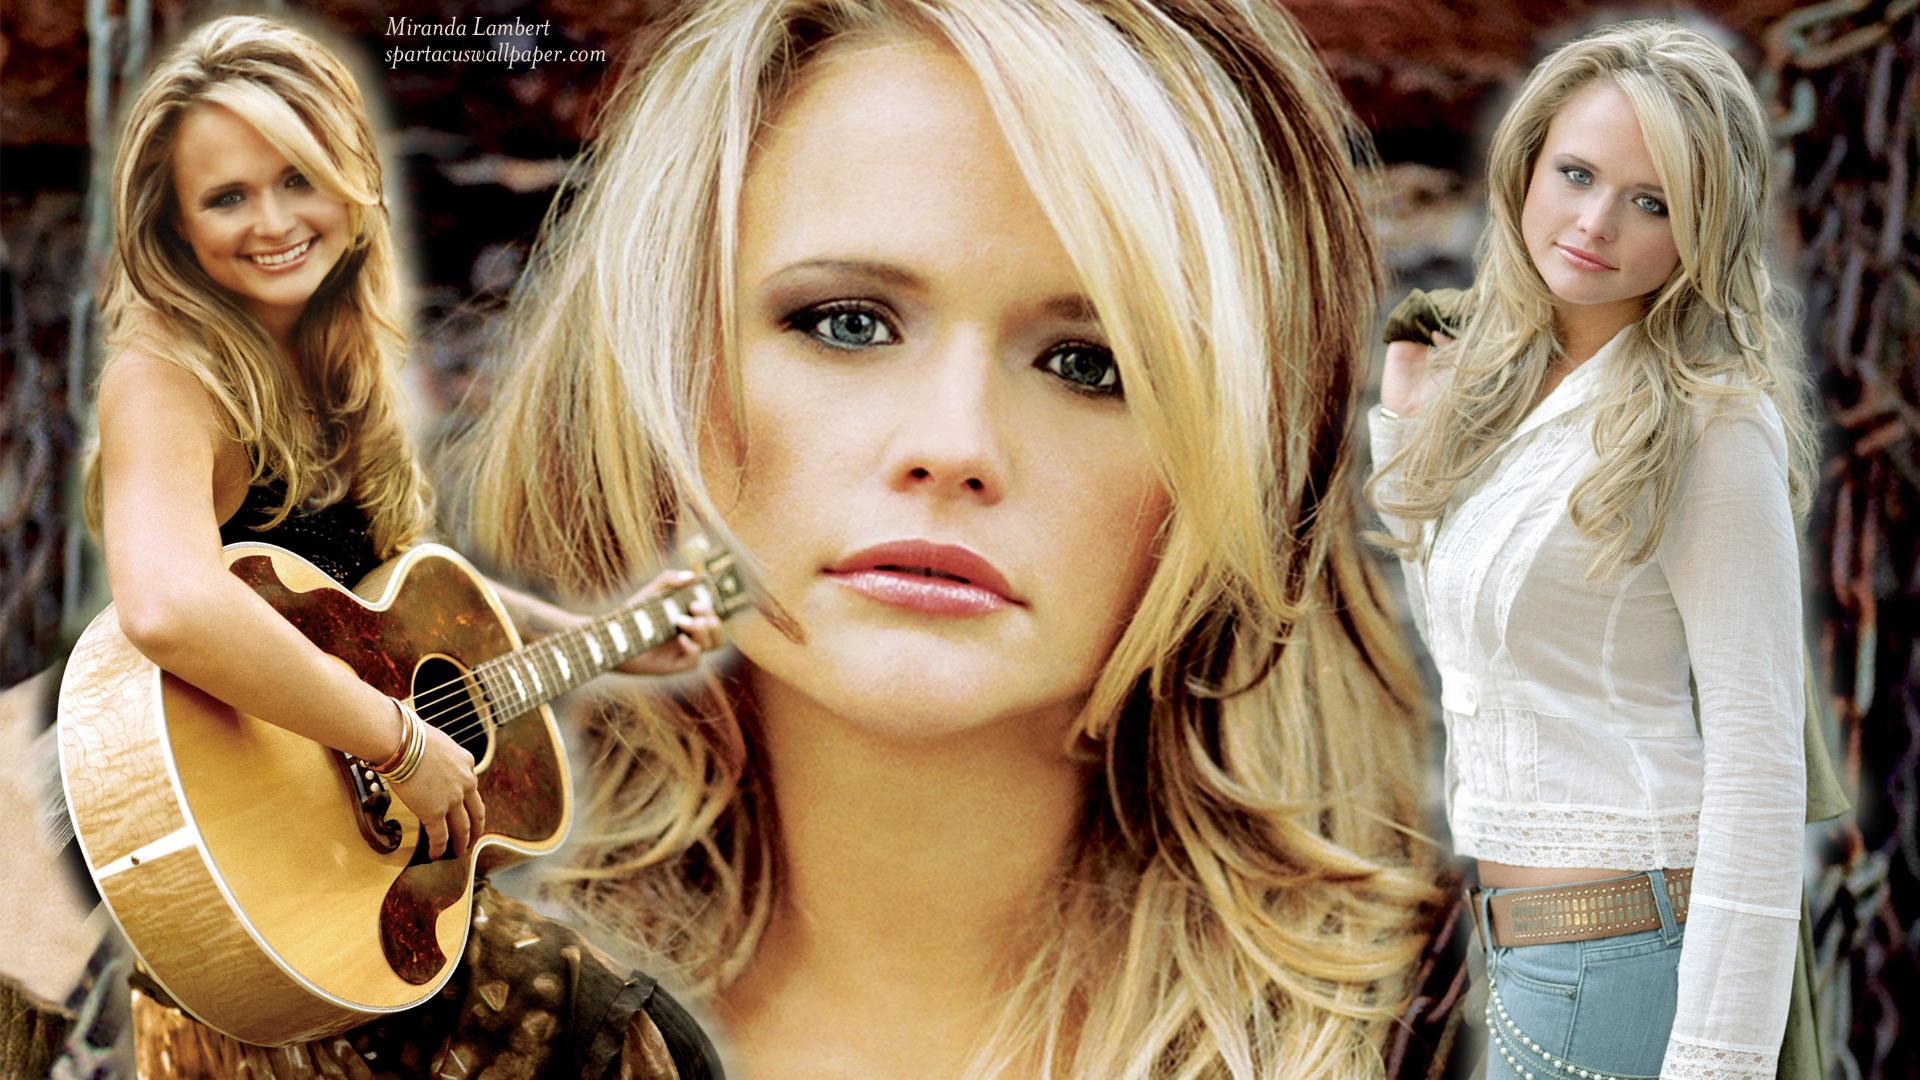 Country Girl Wallpapers Mobile Miranda Lambert Ii Desktop Backgrounds Mobile Home